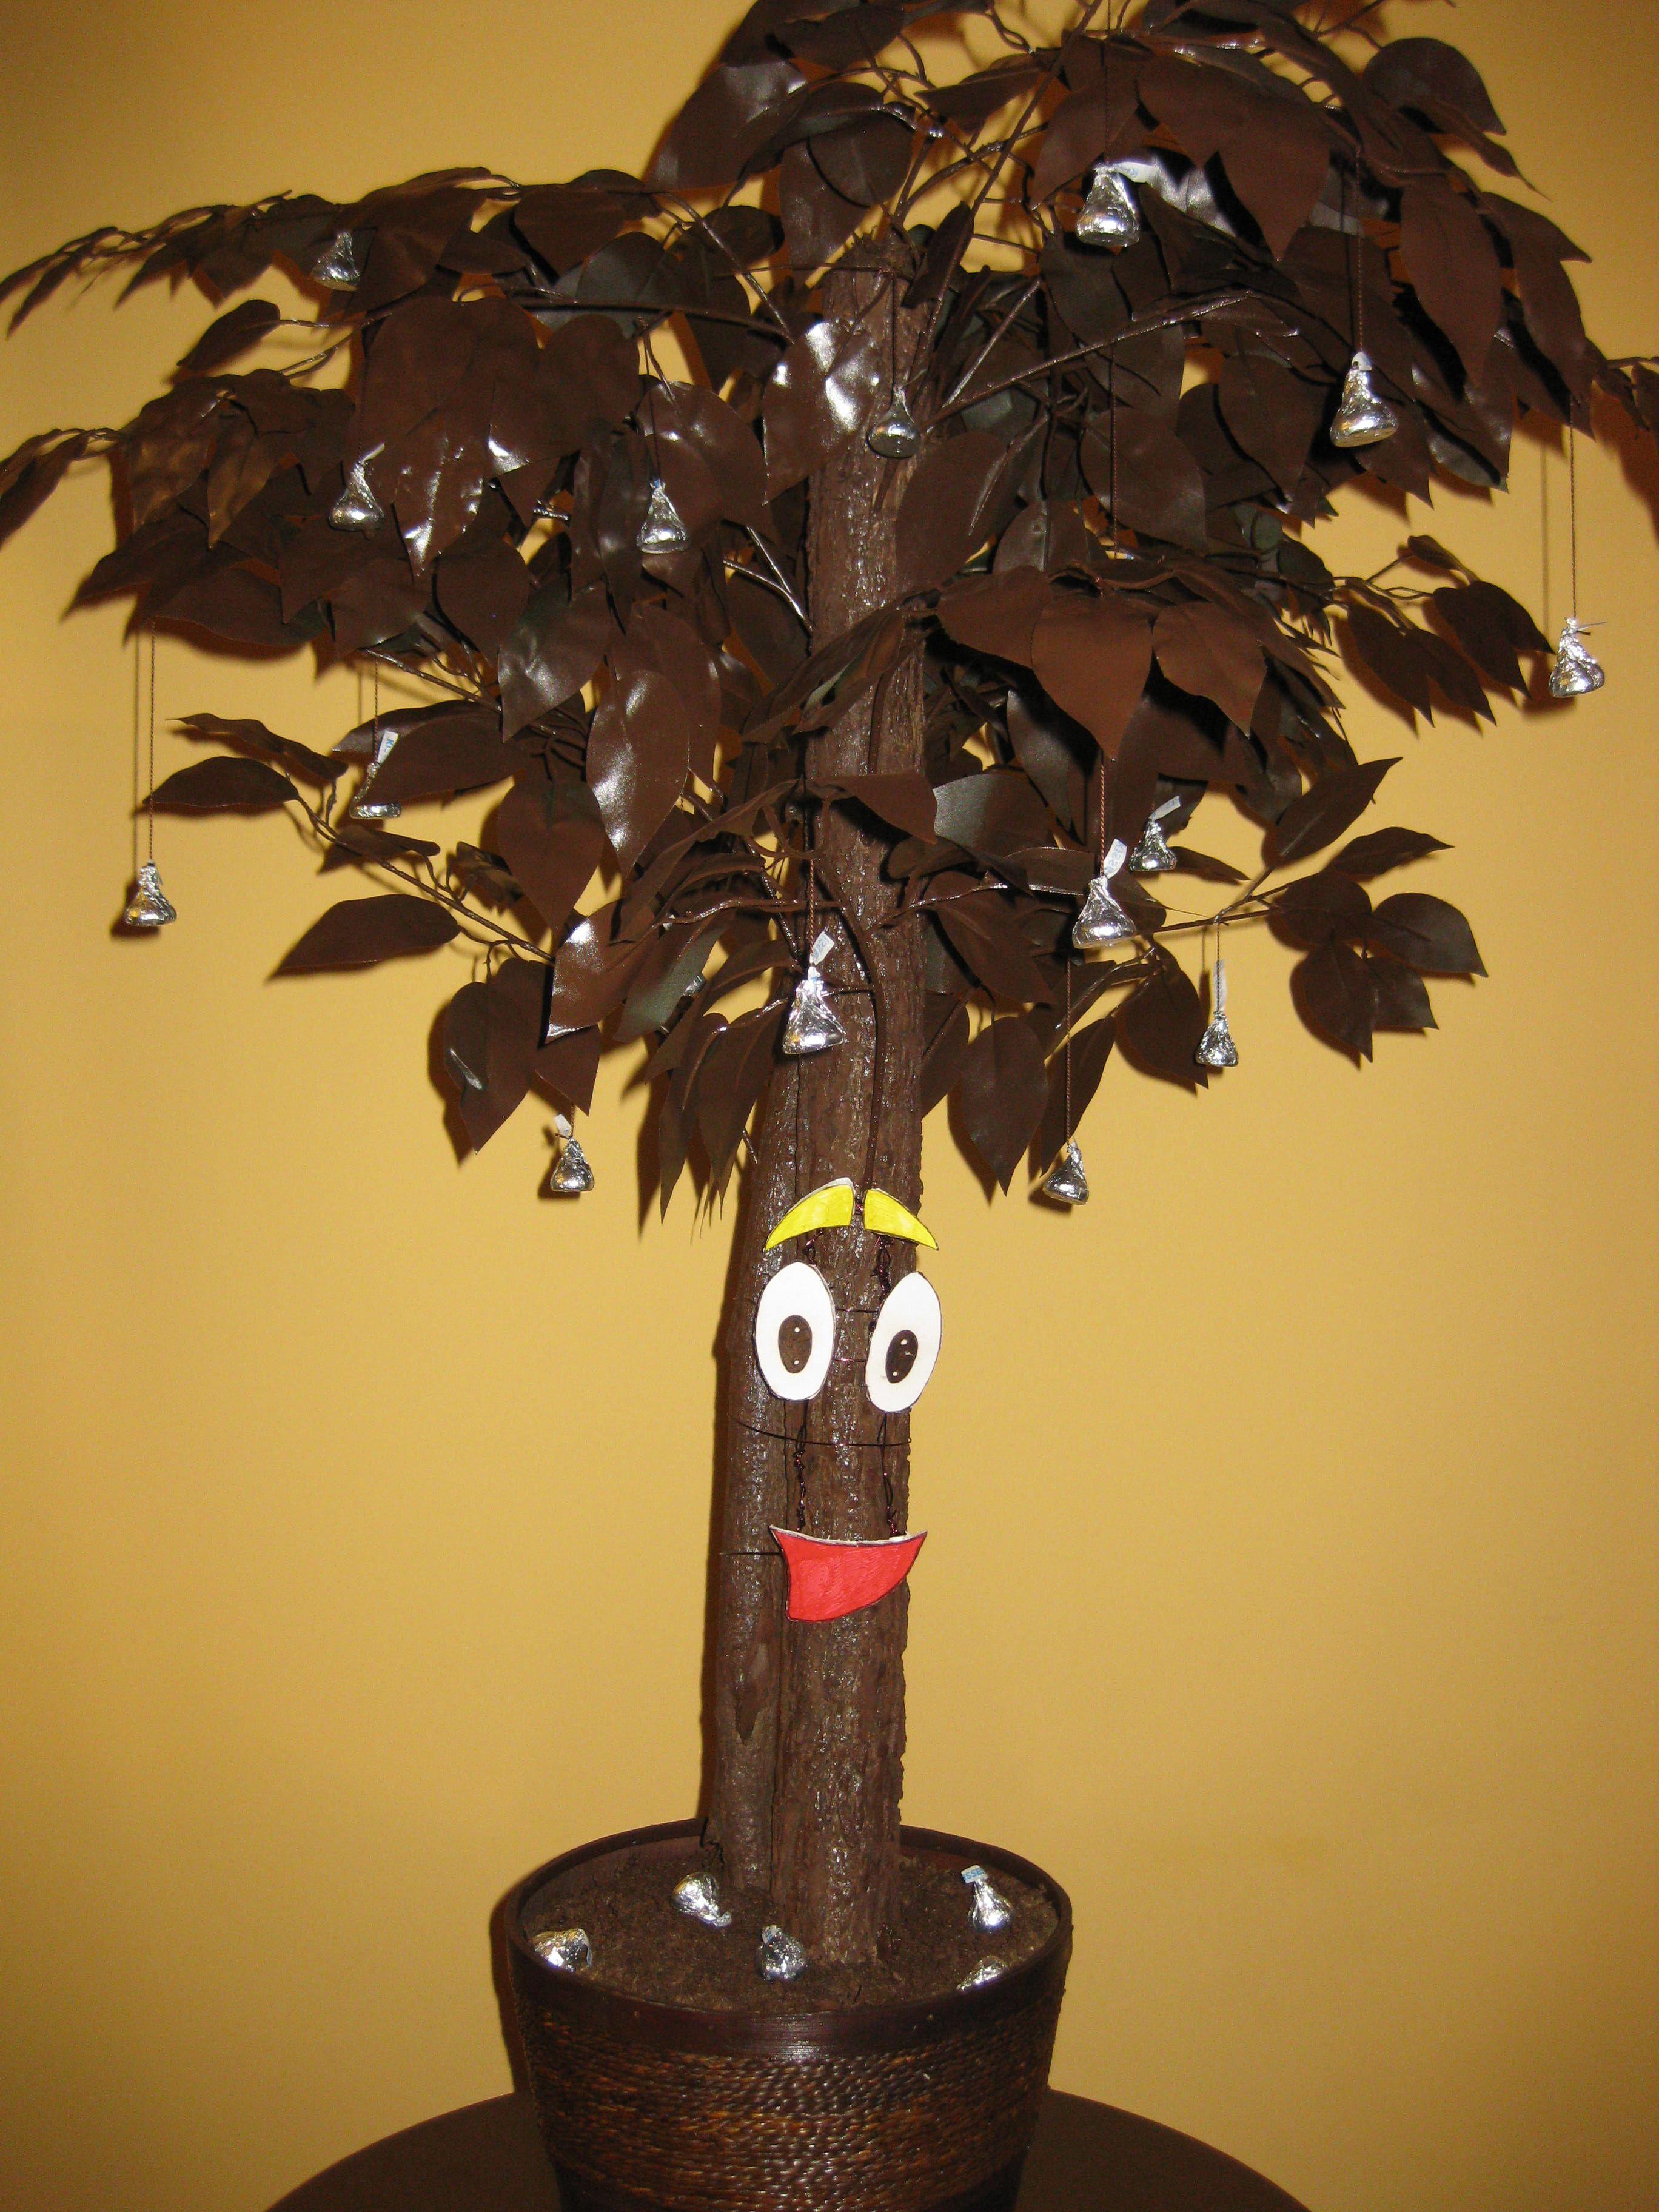 Dora Chocolate Tree with Hershey's kisses